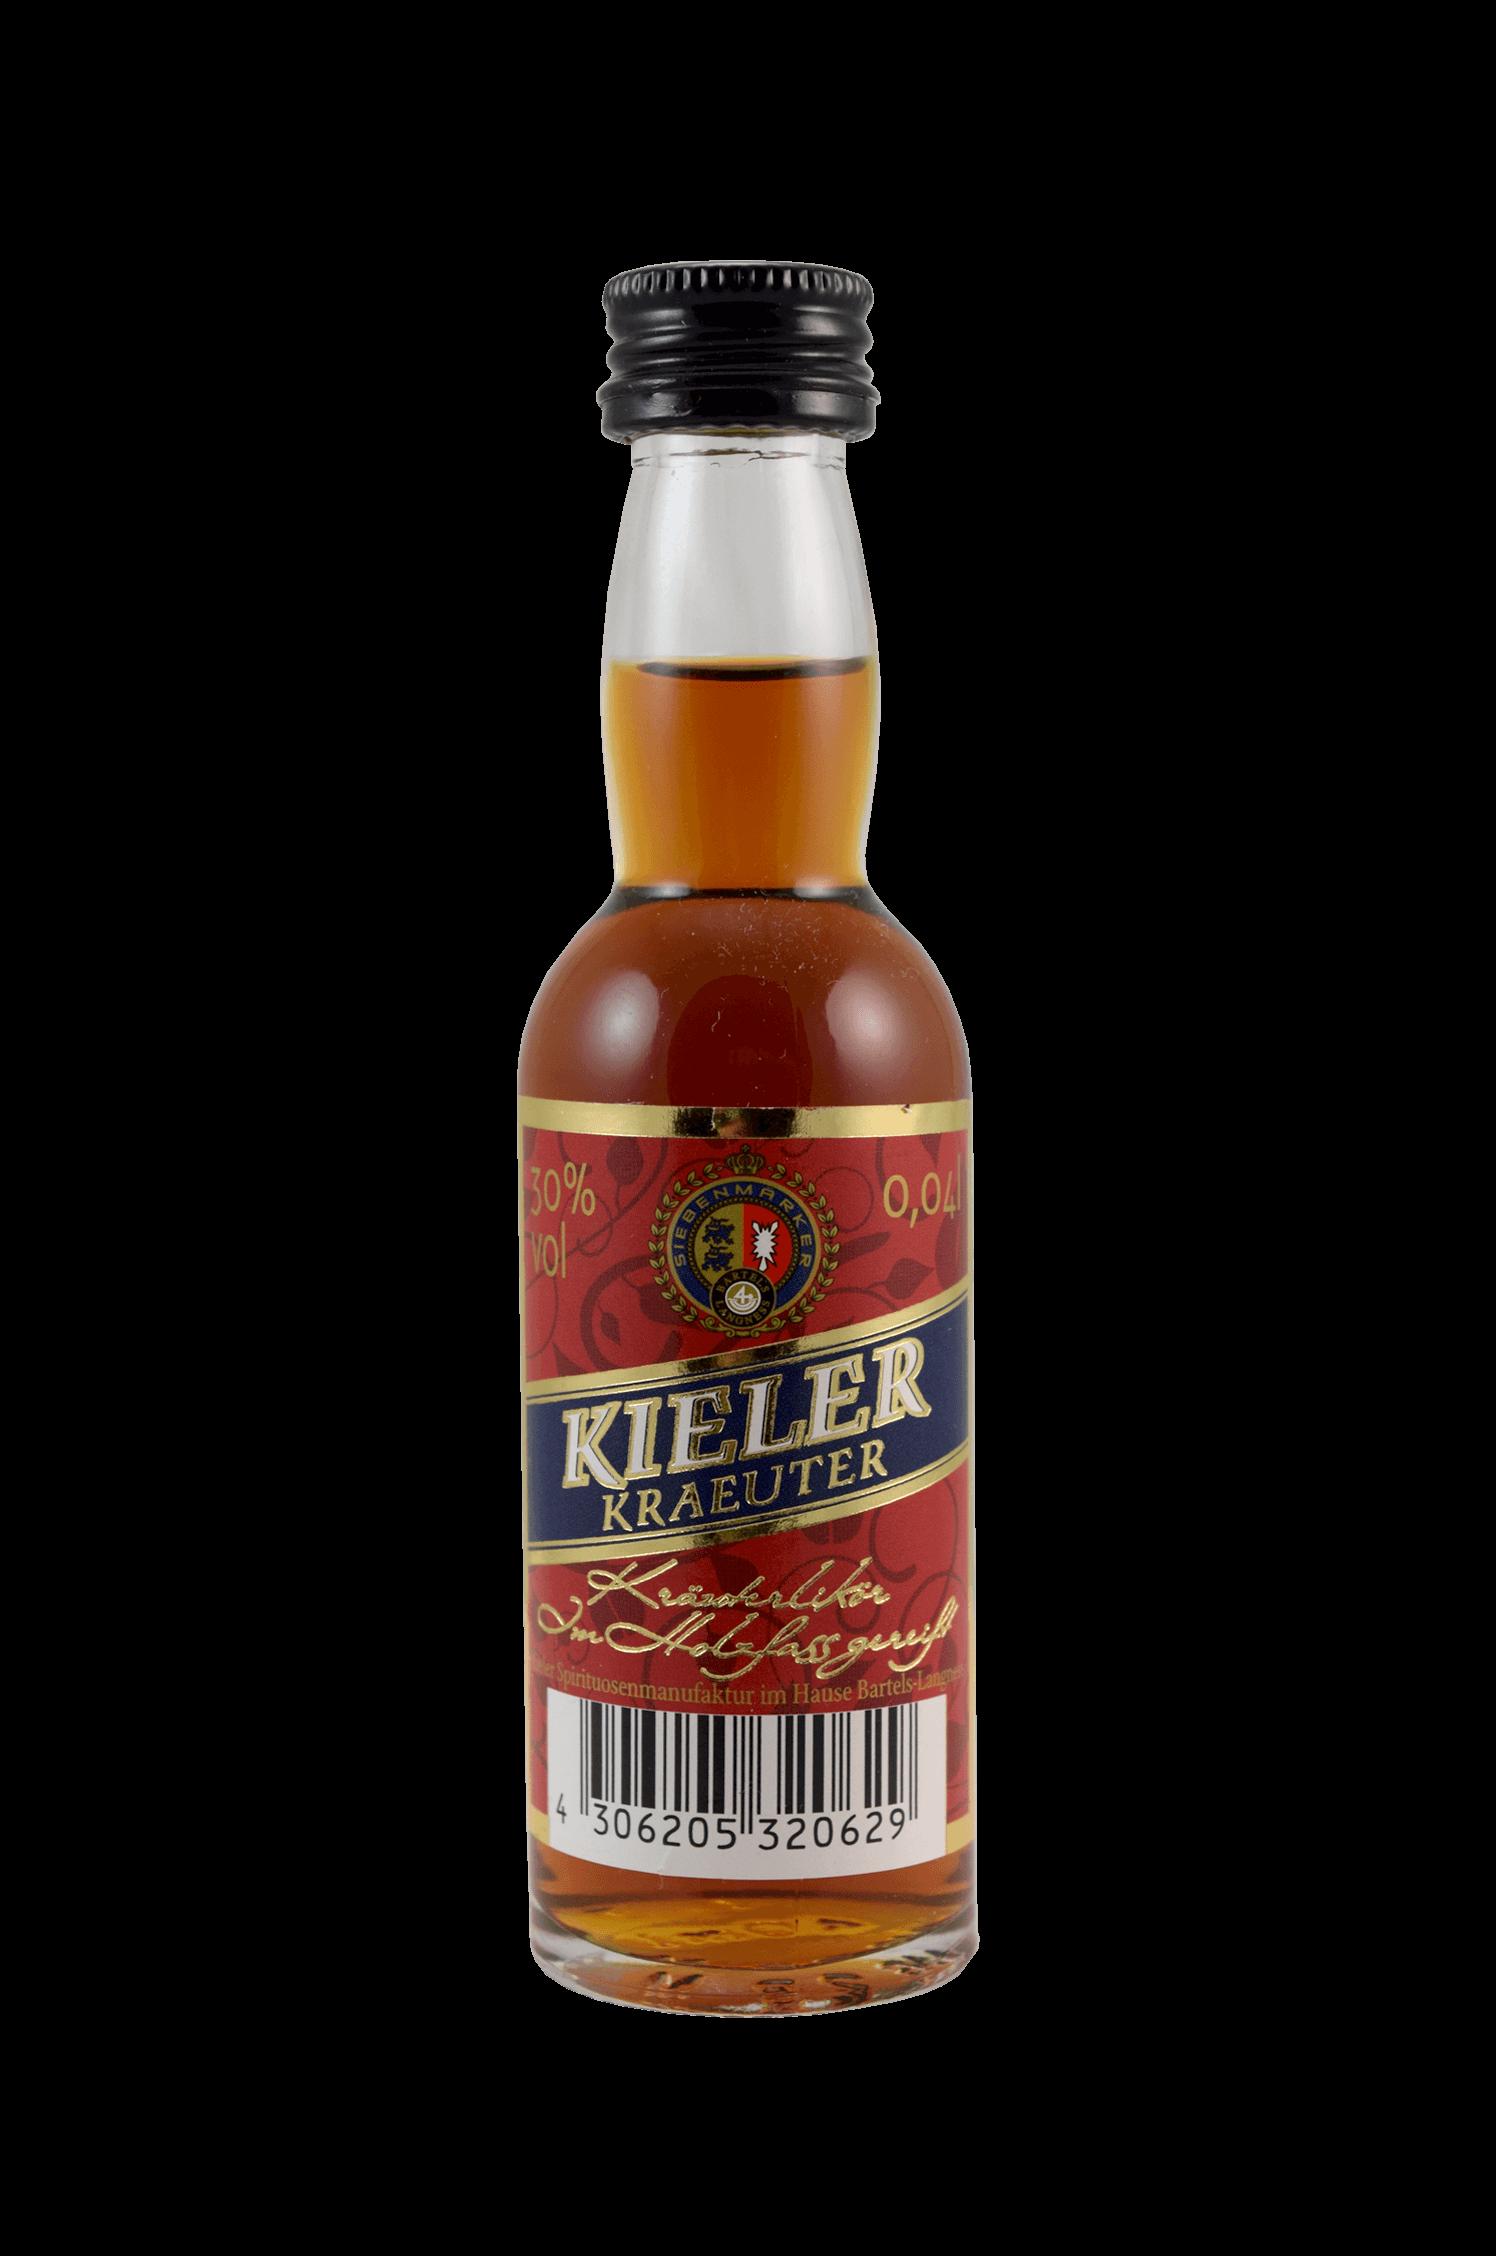 Kieler Kraeuter